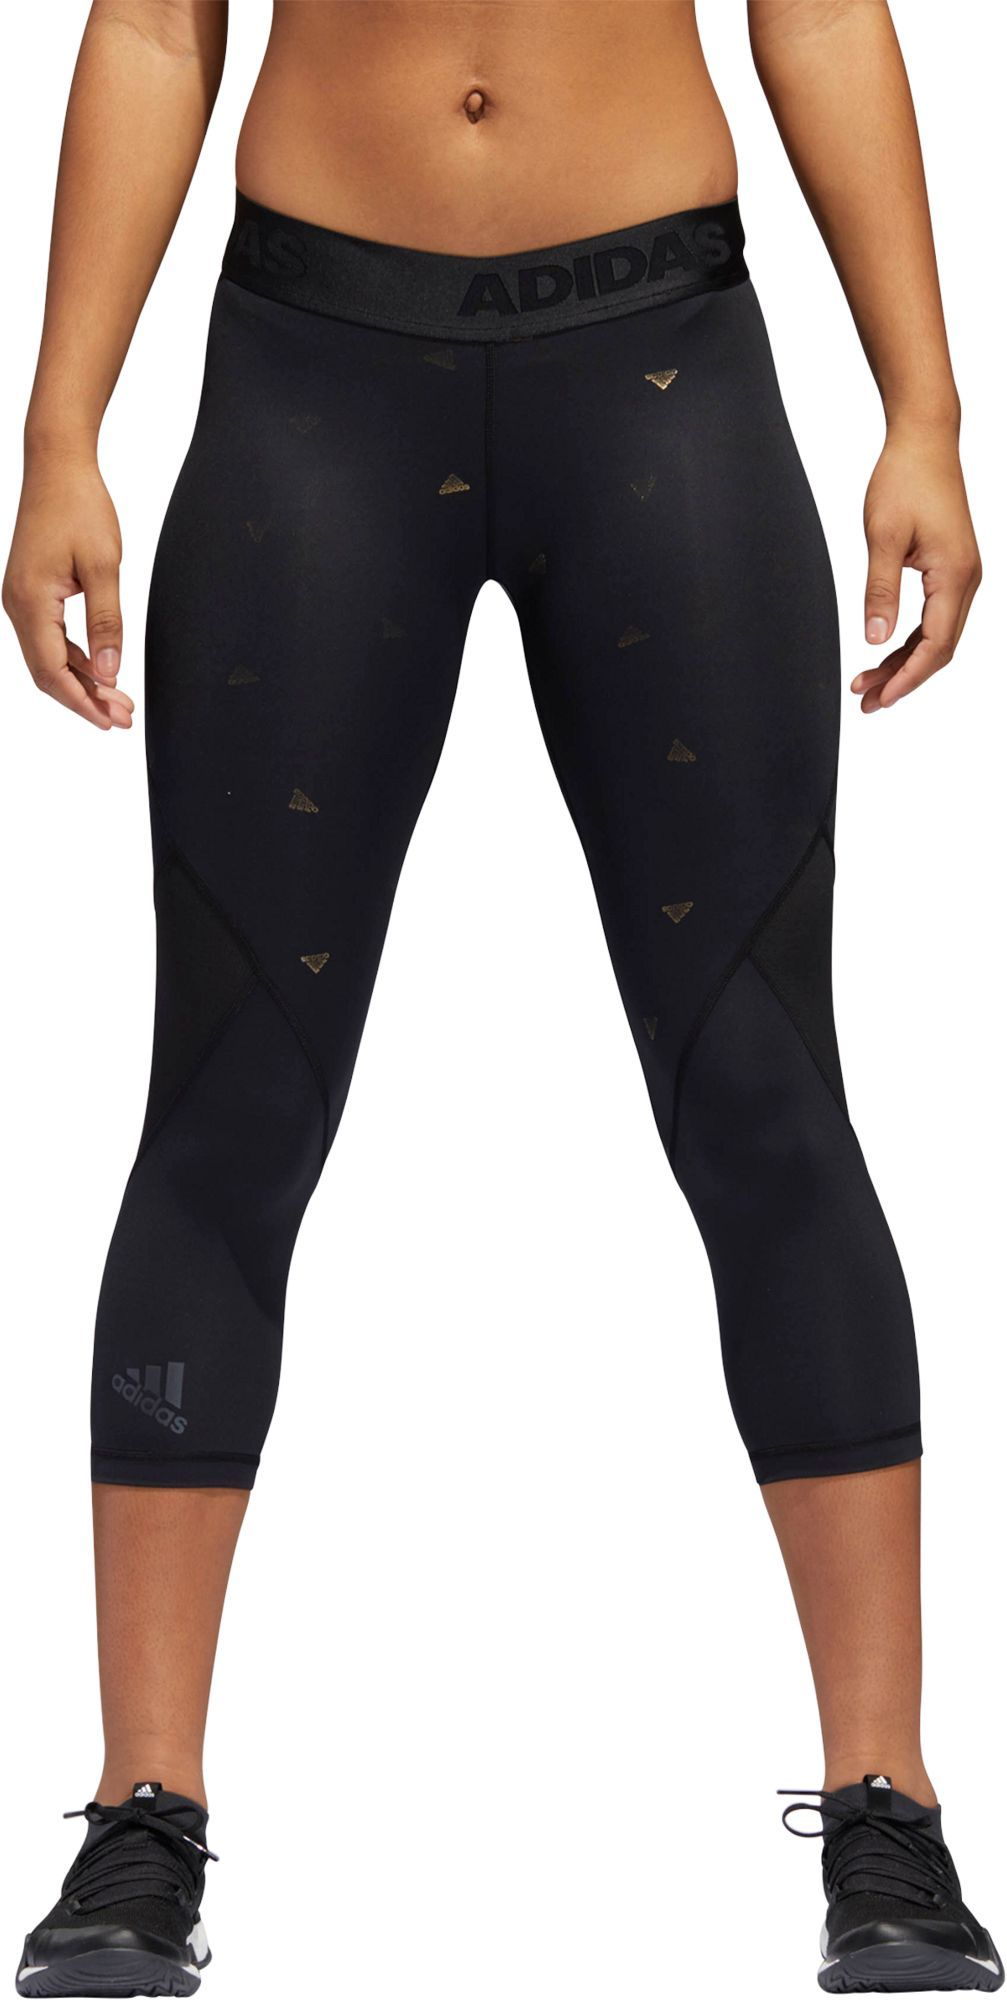 de8f13bd570 adidas Women's Alphaskin Sport Capri Tights, Size: XS, Black ...